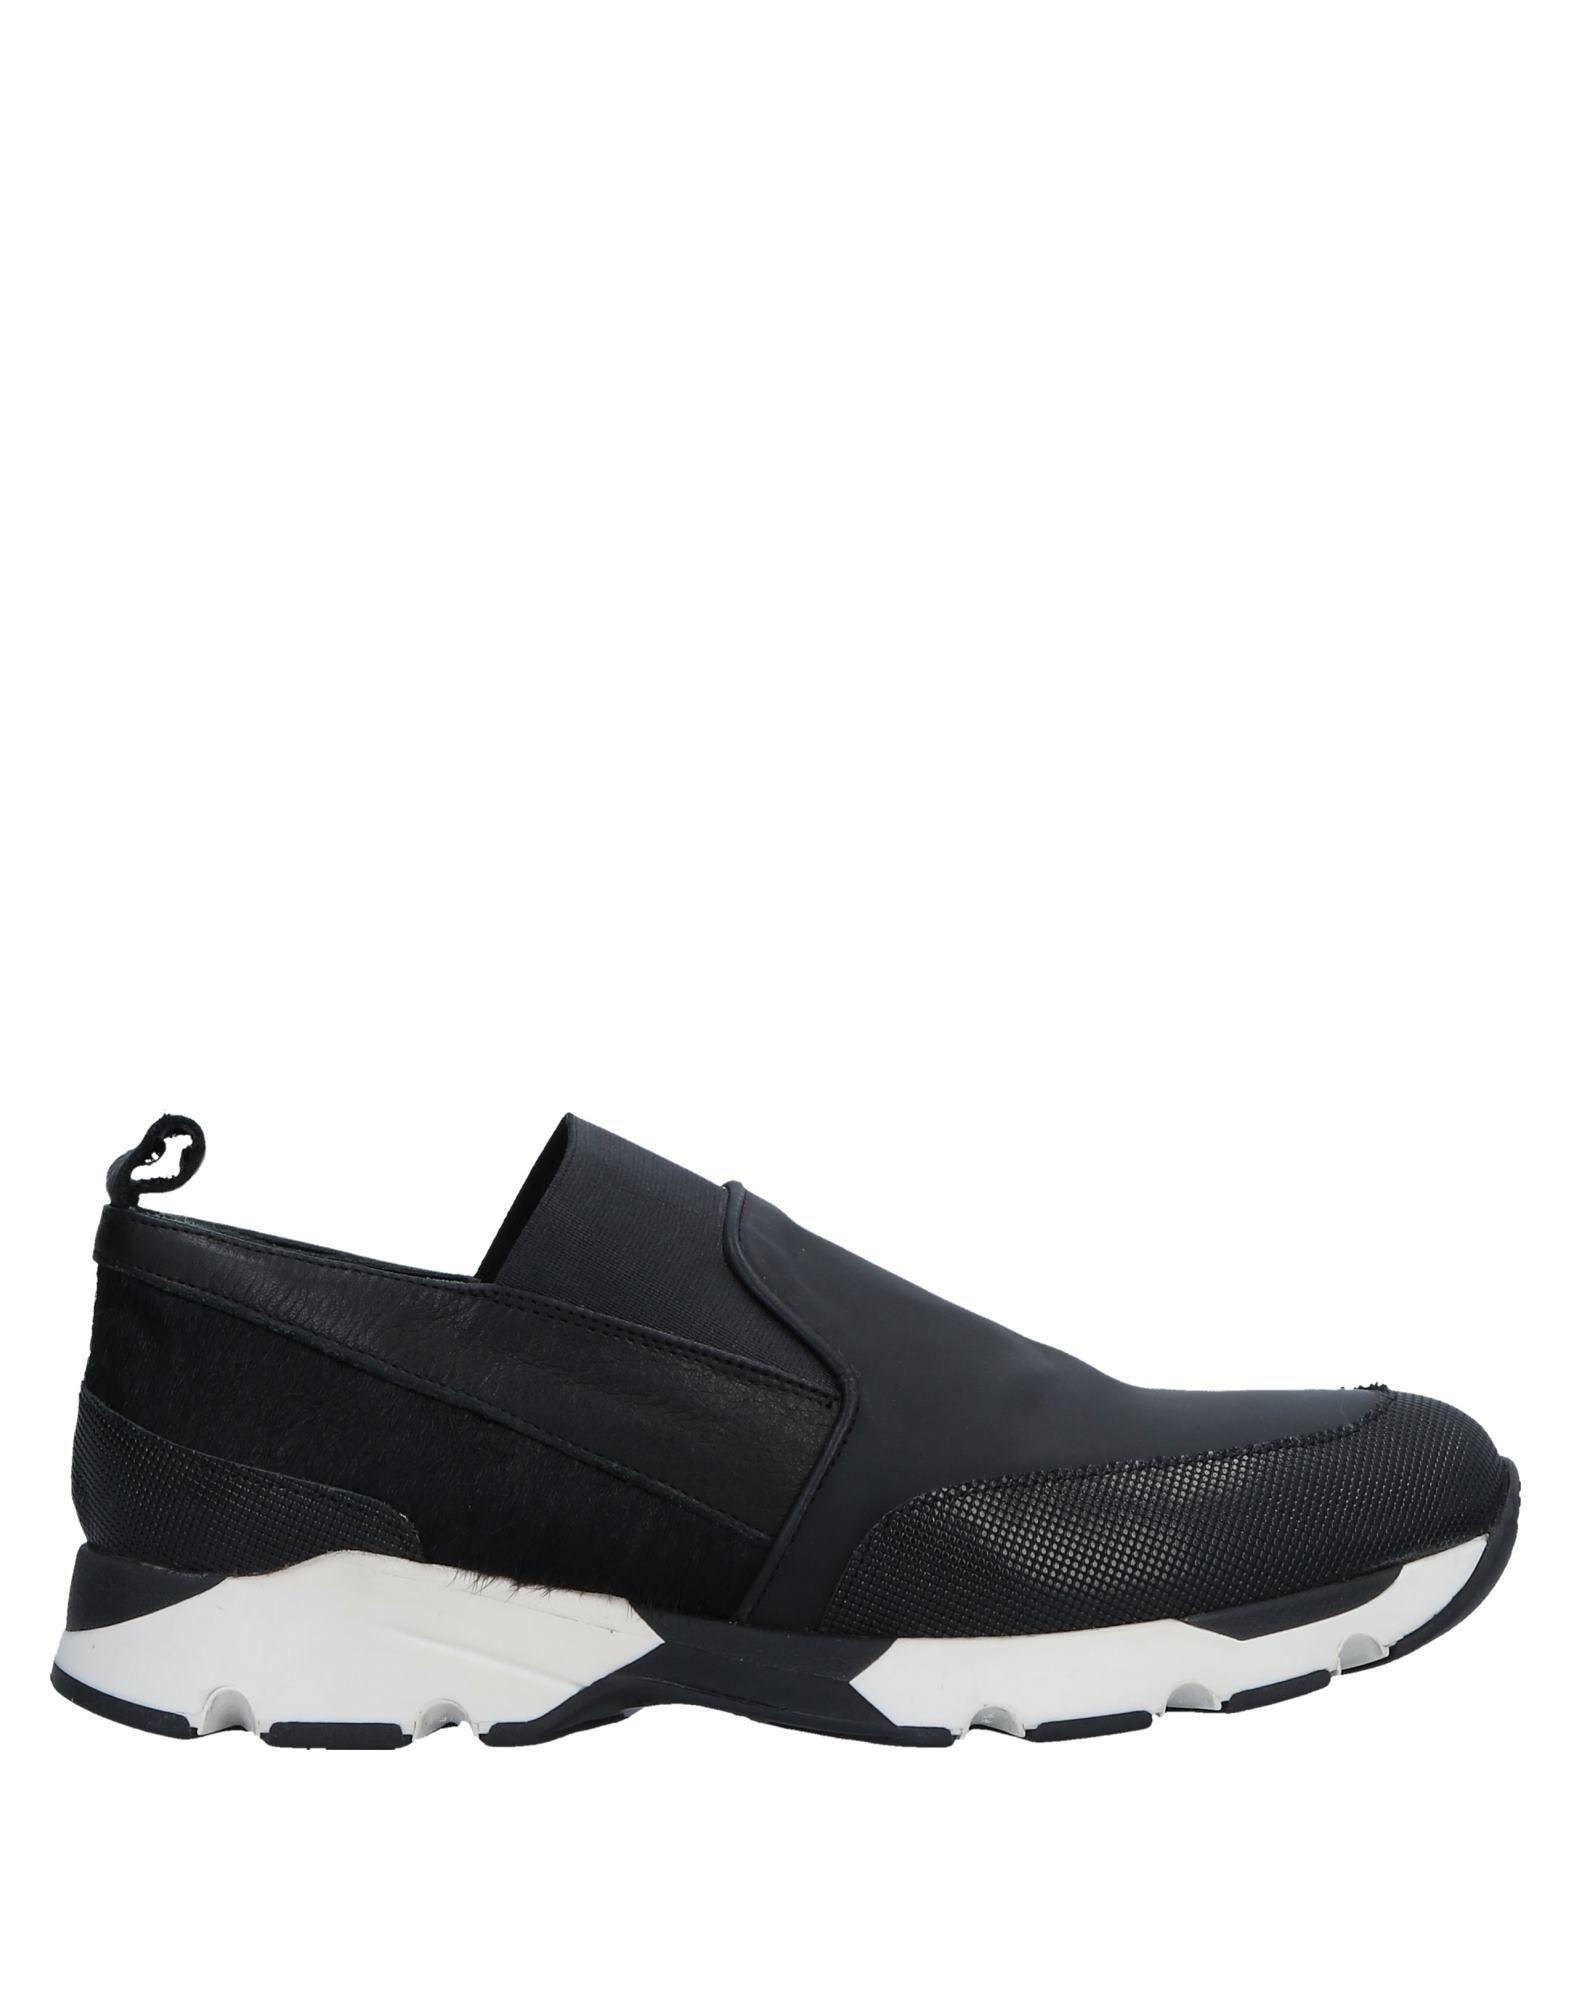 Moda Sneakers Ottod'ame Donna - 11530279AA